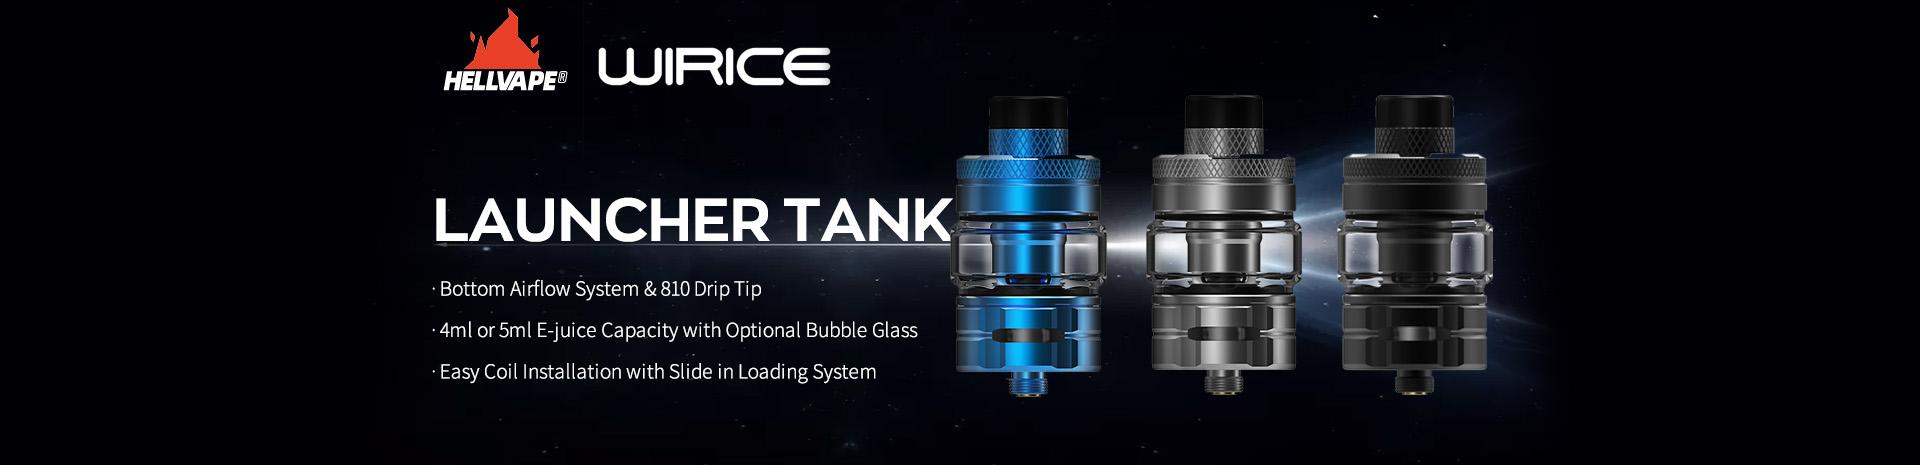 Wirice × Hellvape Launcher Tank Banner